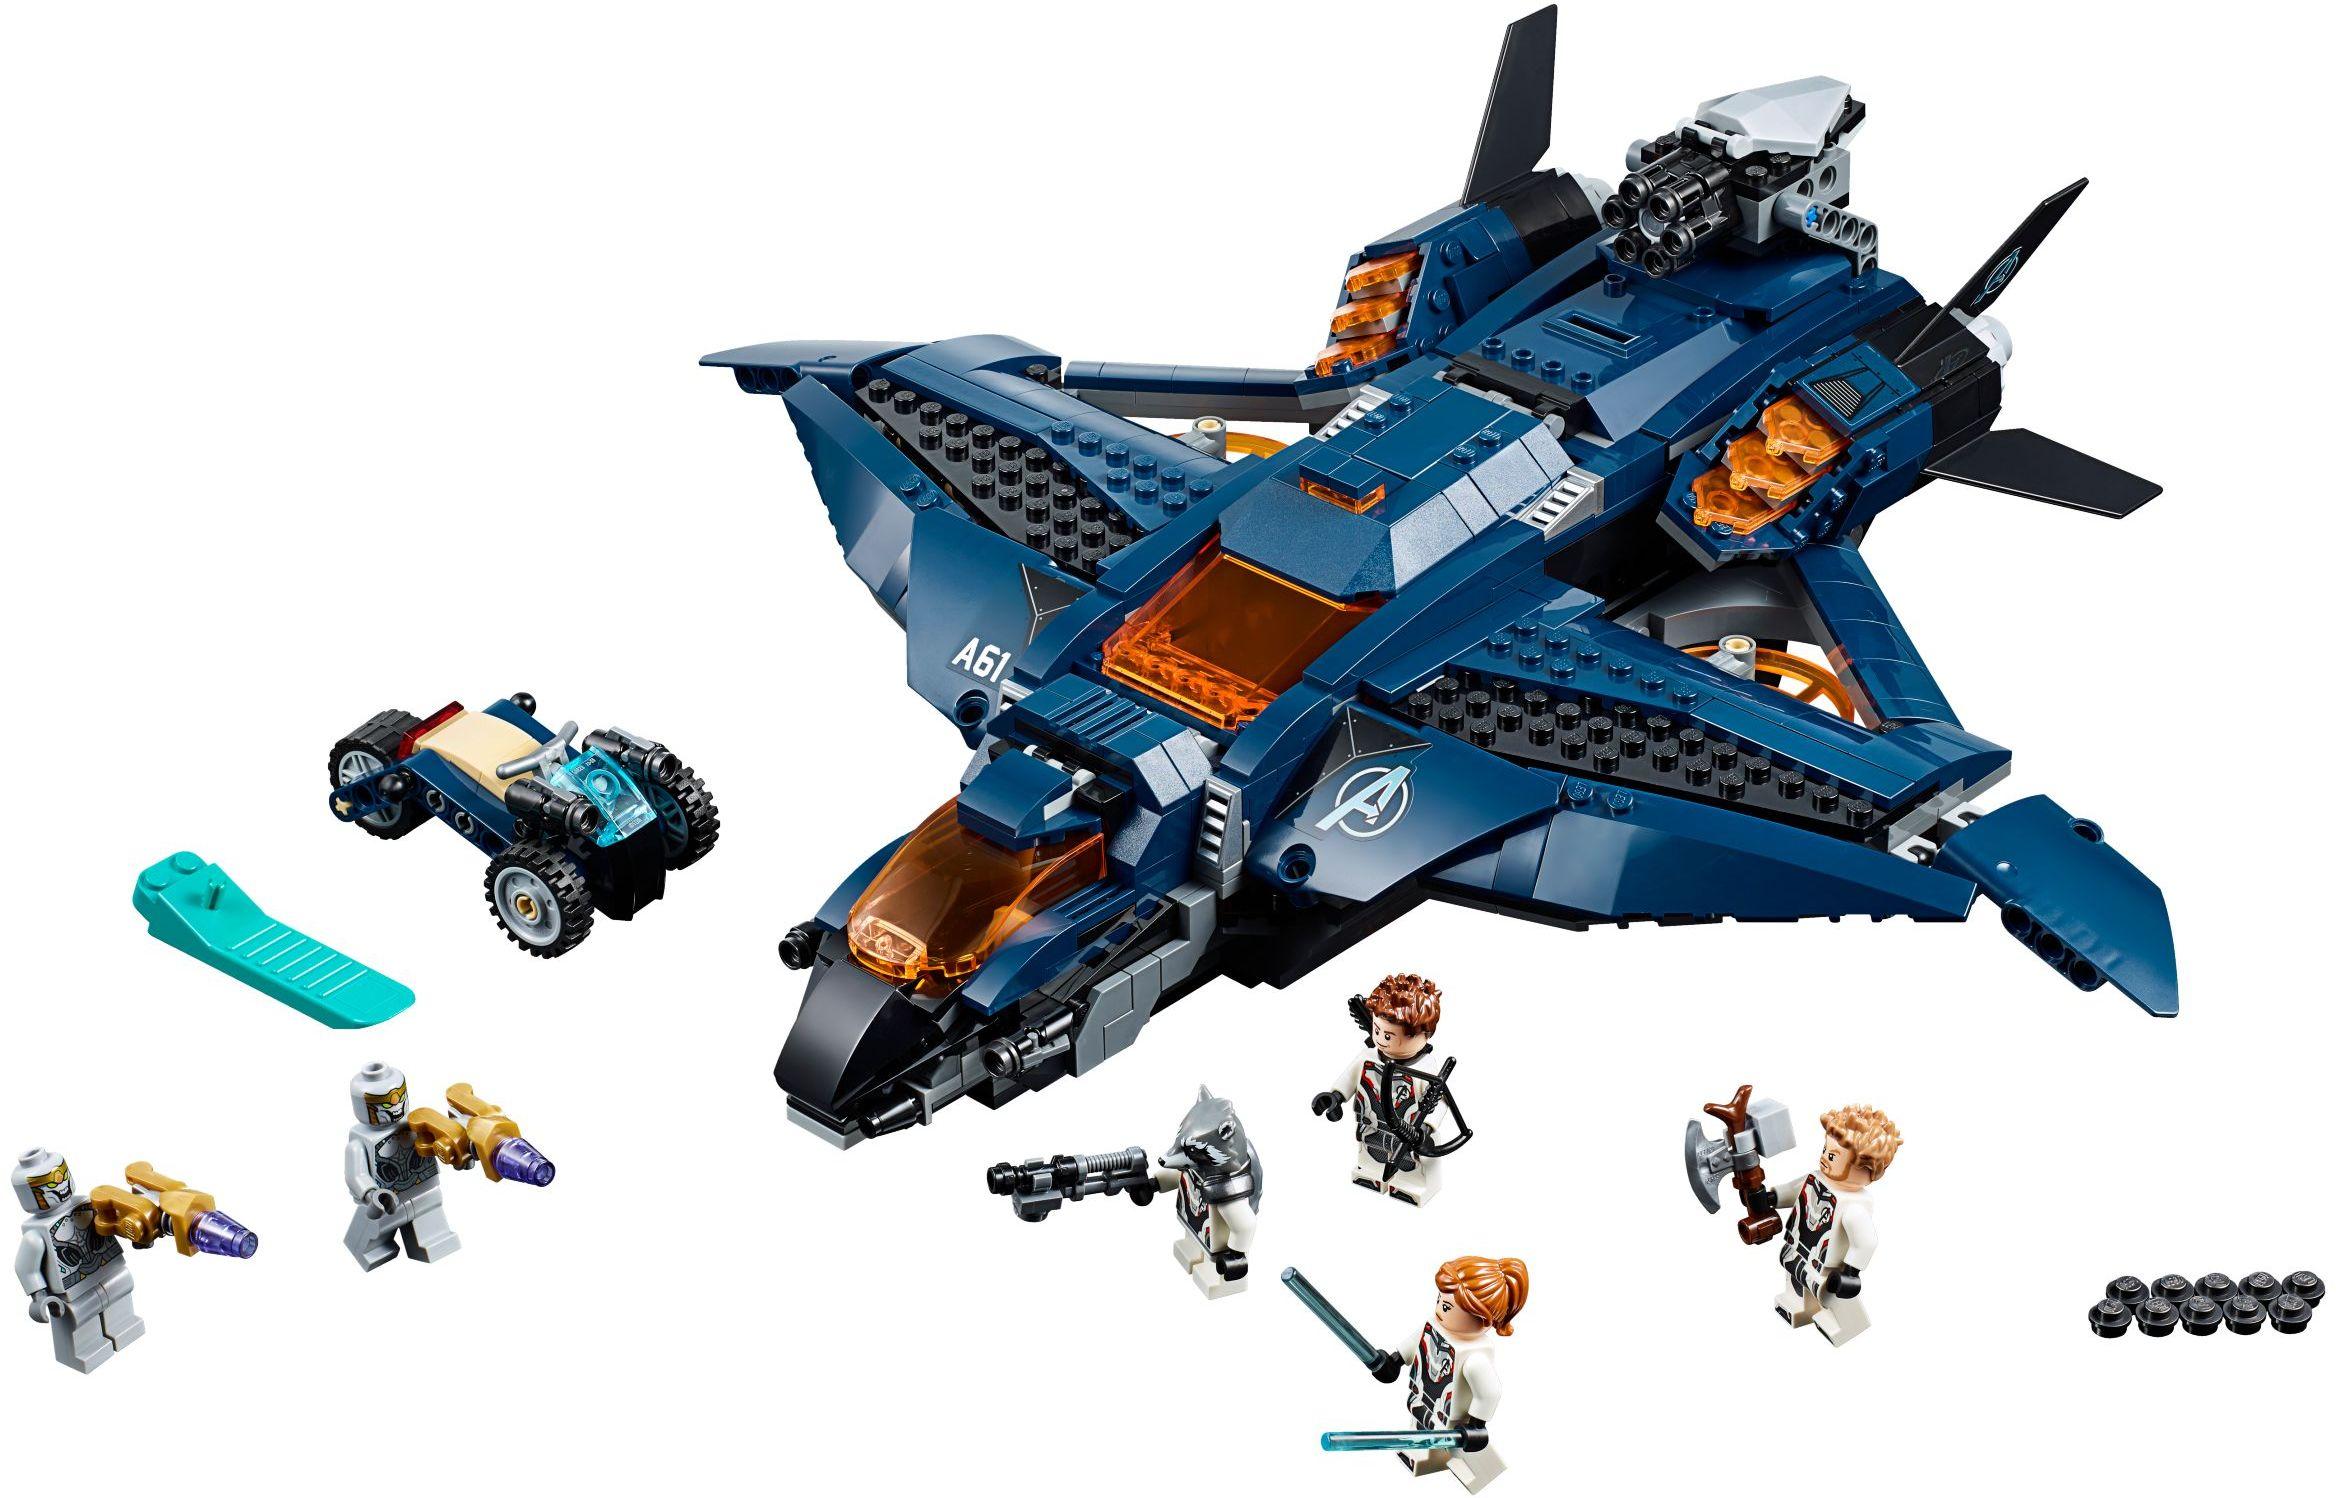 DECOOL 7141 Avengers Quinn Fighter (Delicate Edition) Avengers Ultimate Quinjet Super Heros Compatible LEGO 76126